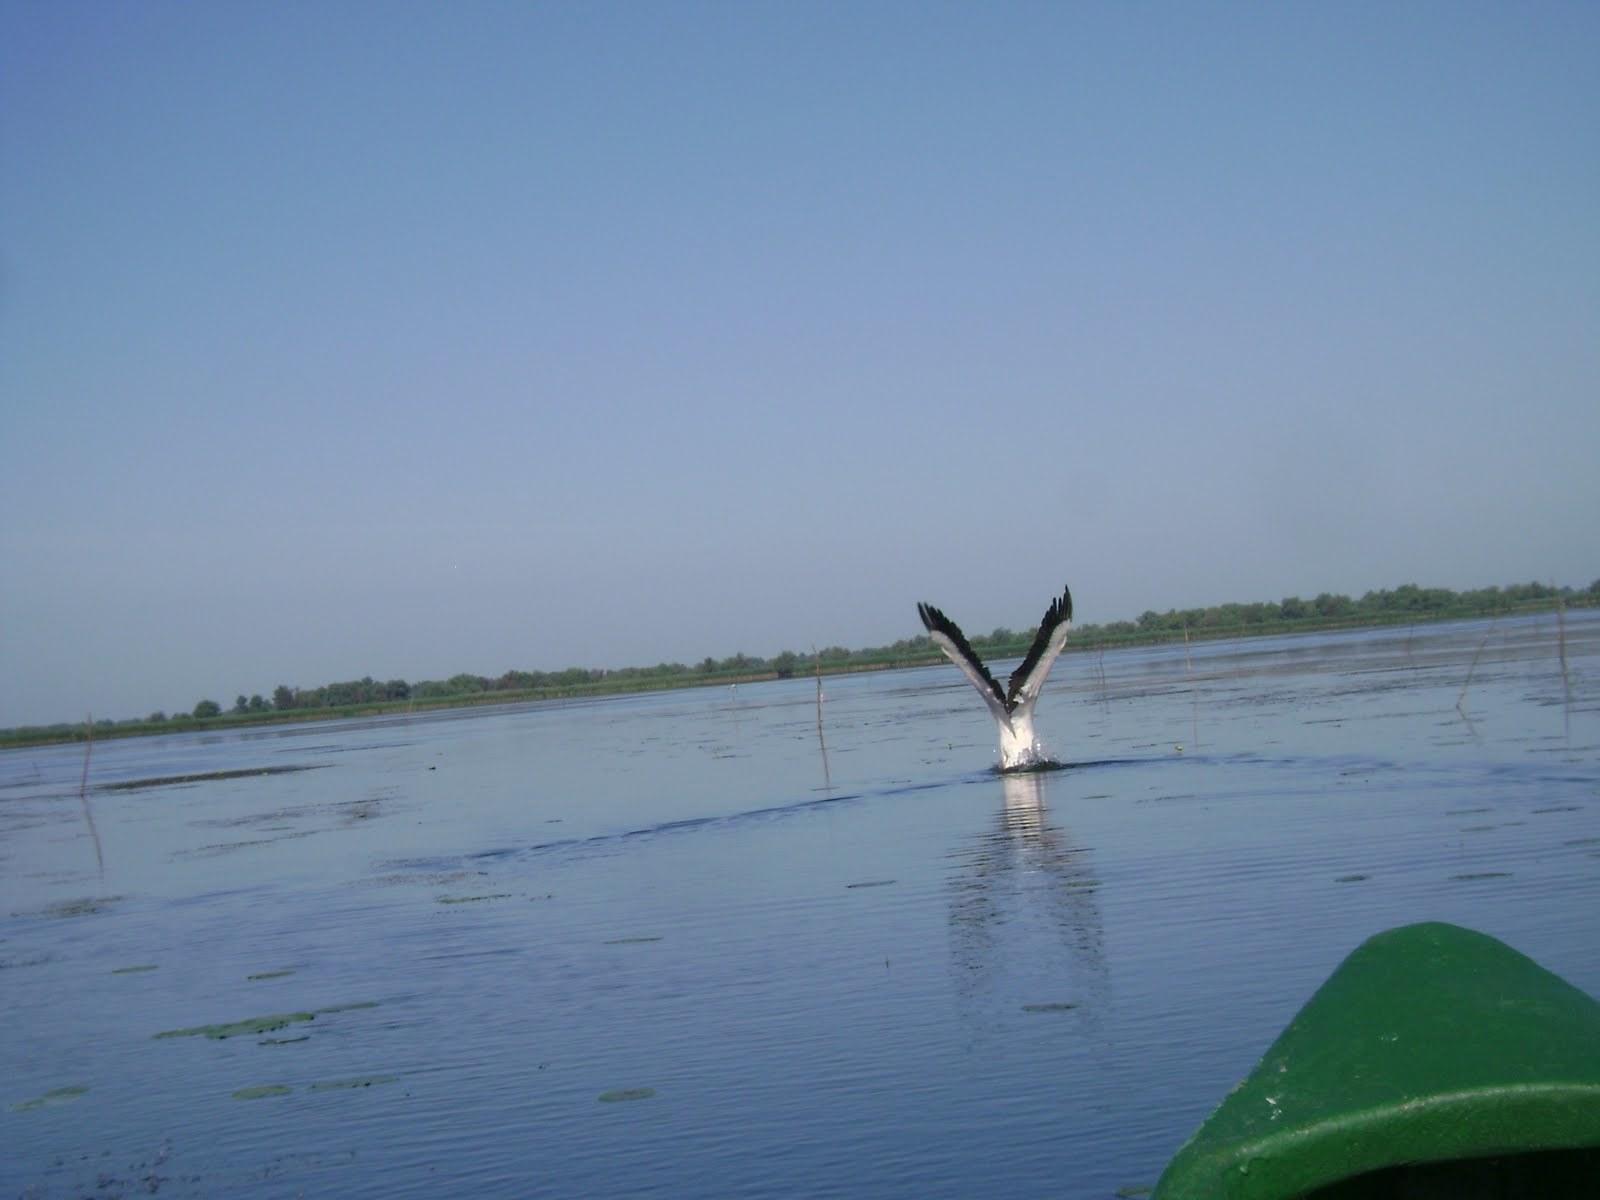 pescuit pe lacul ligheanca in delta